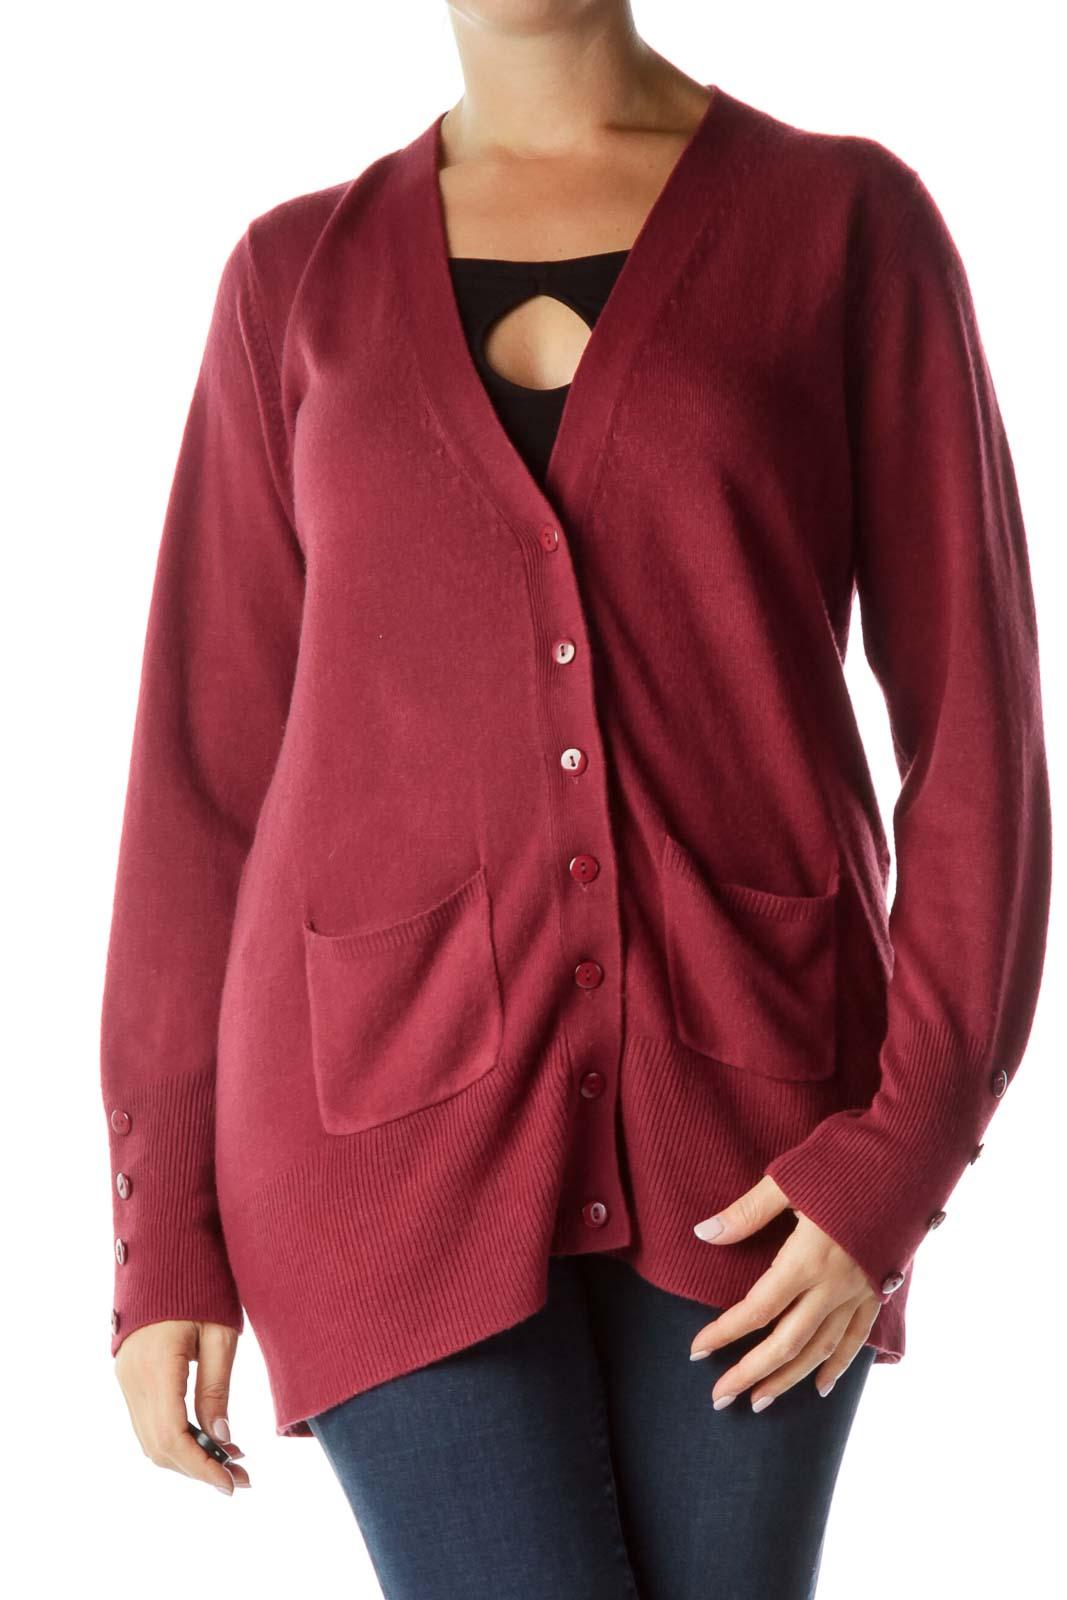 Purple Knit Buttoned Cardigan